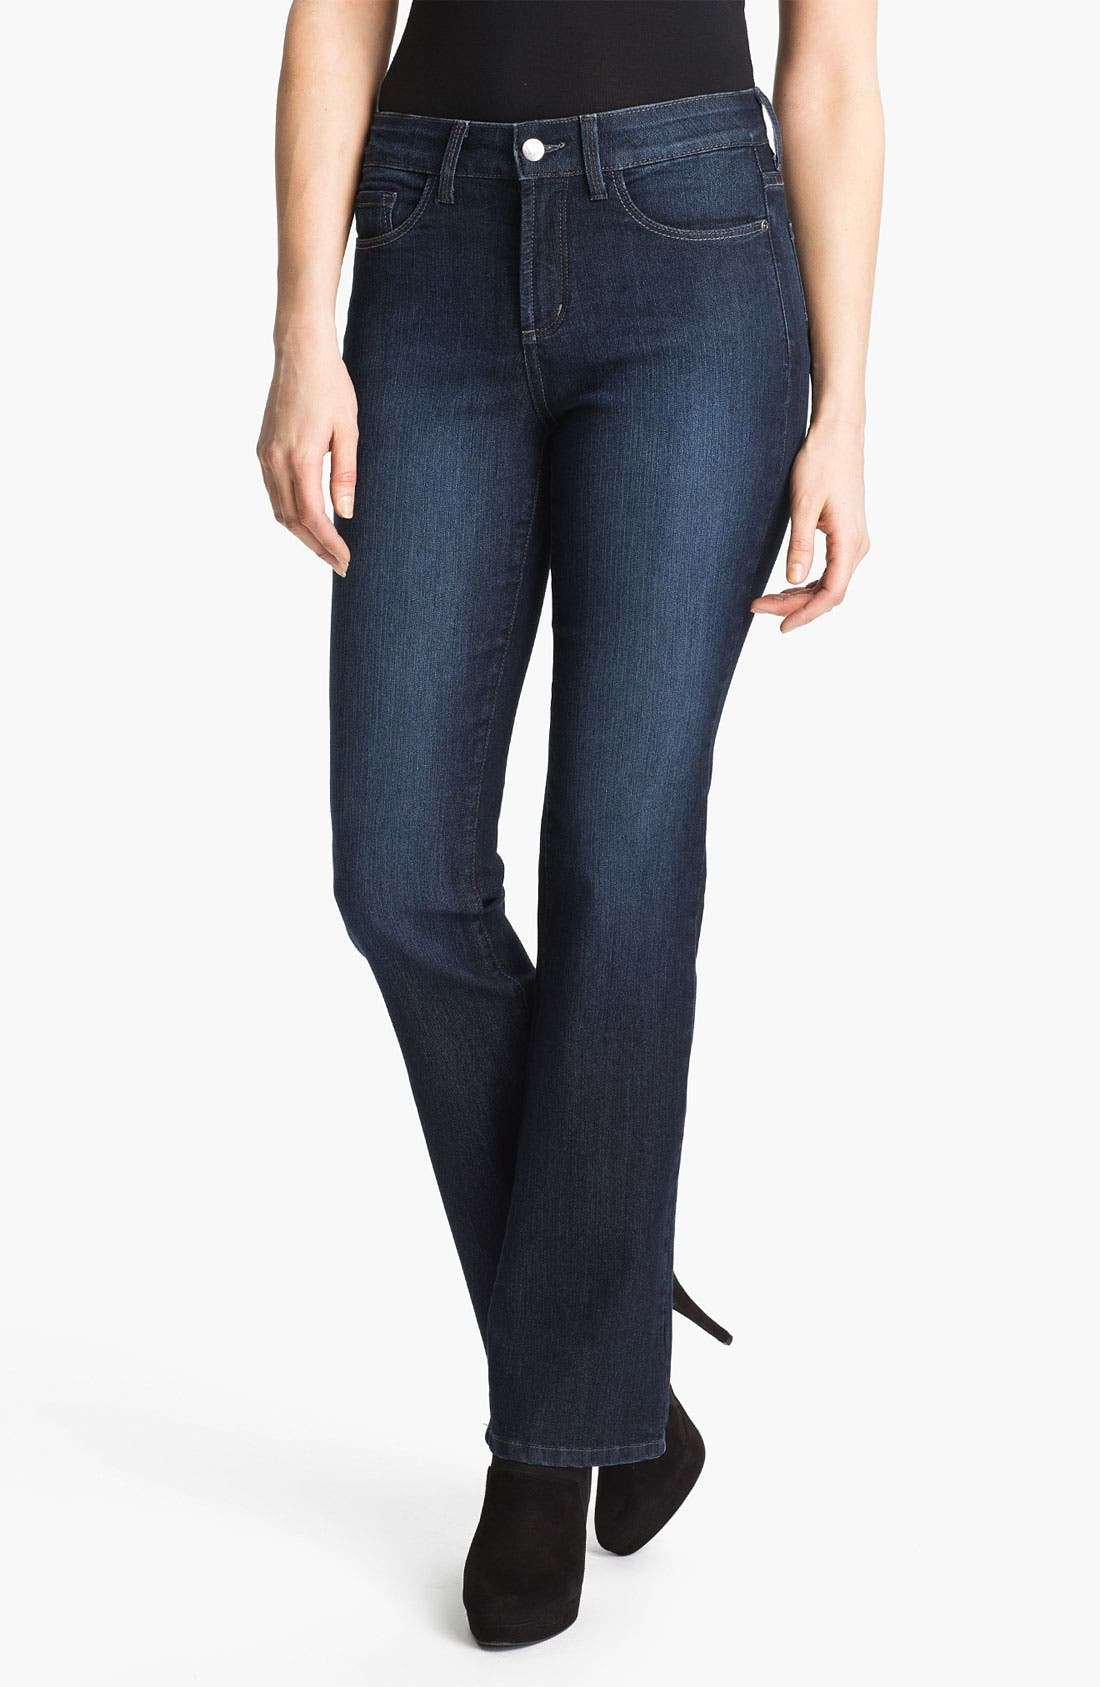 Main Image - NYDJ 'Barbara' Embellished Bootcut Jeans